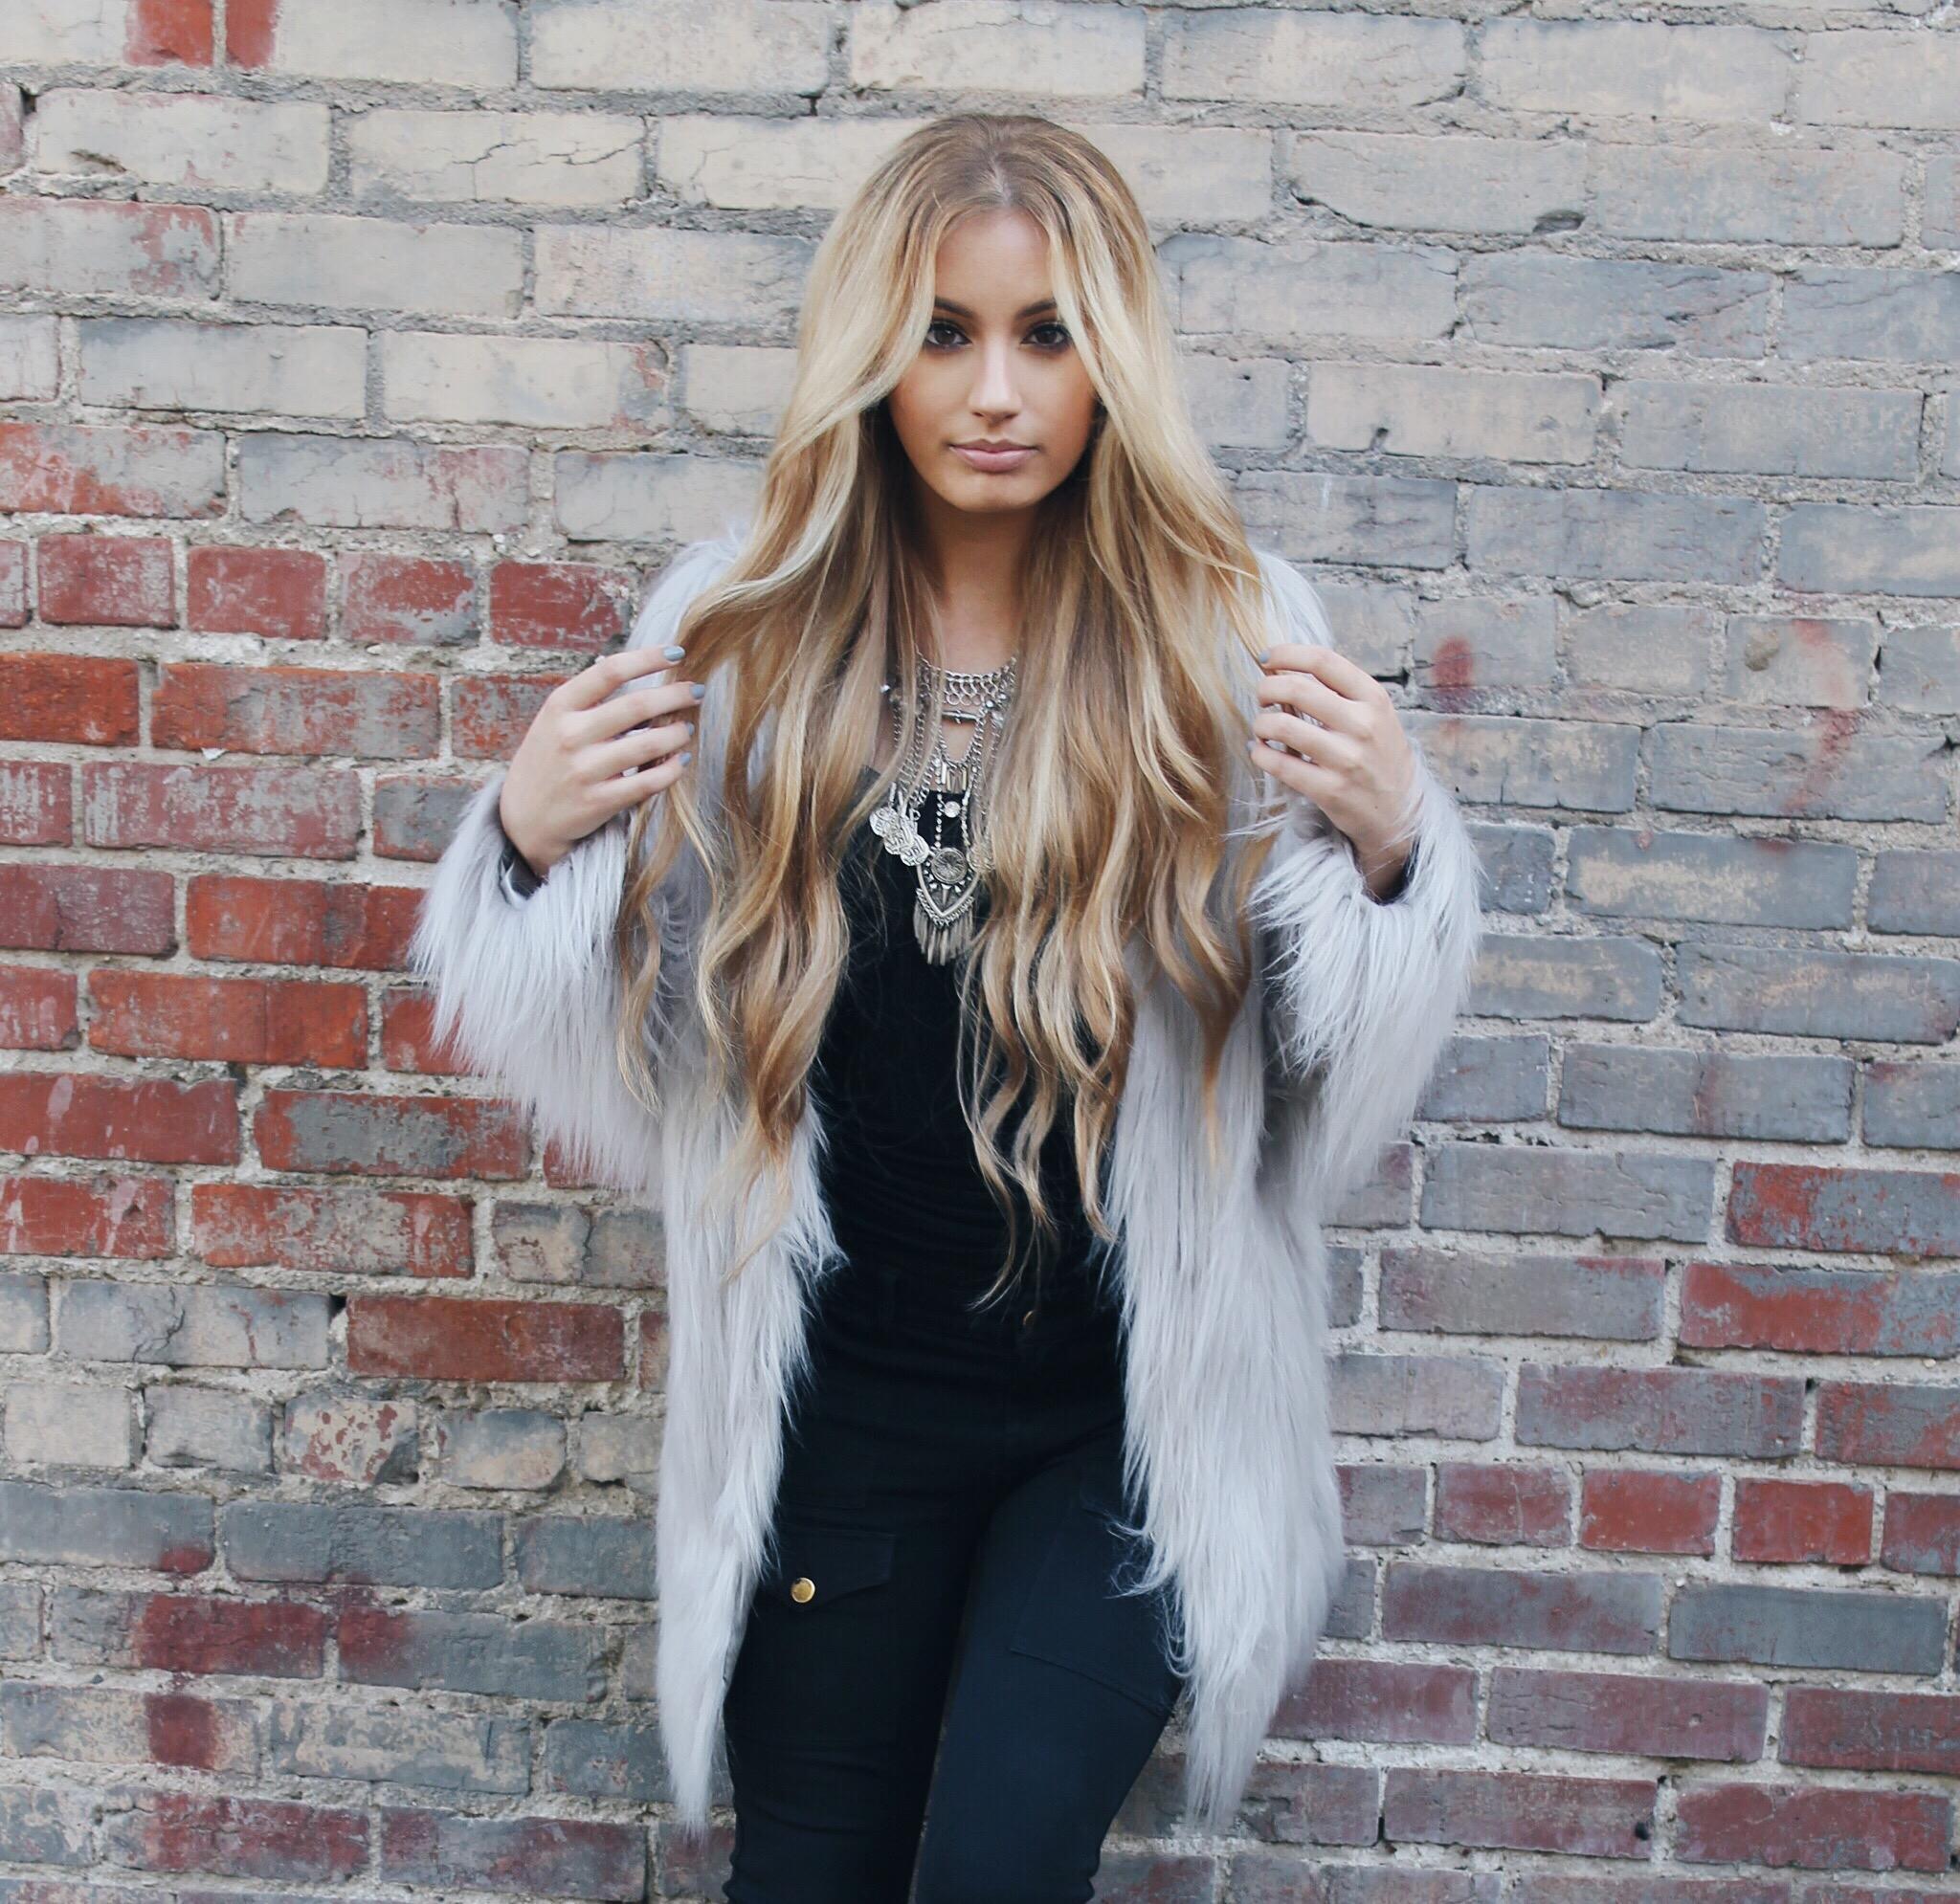 Blonde Hair Style By Kaitlynn